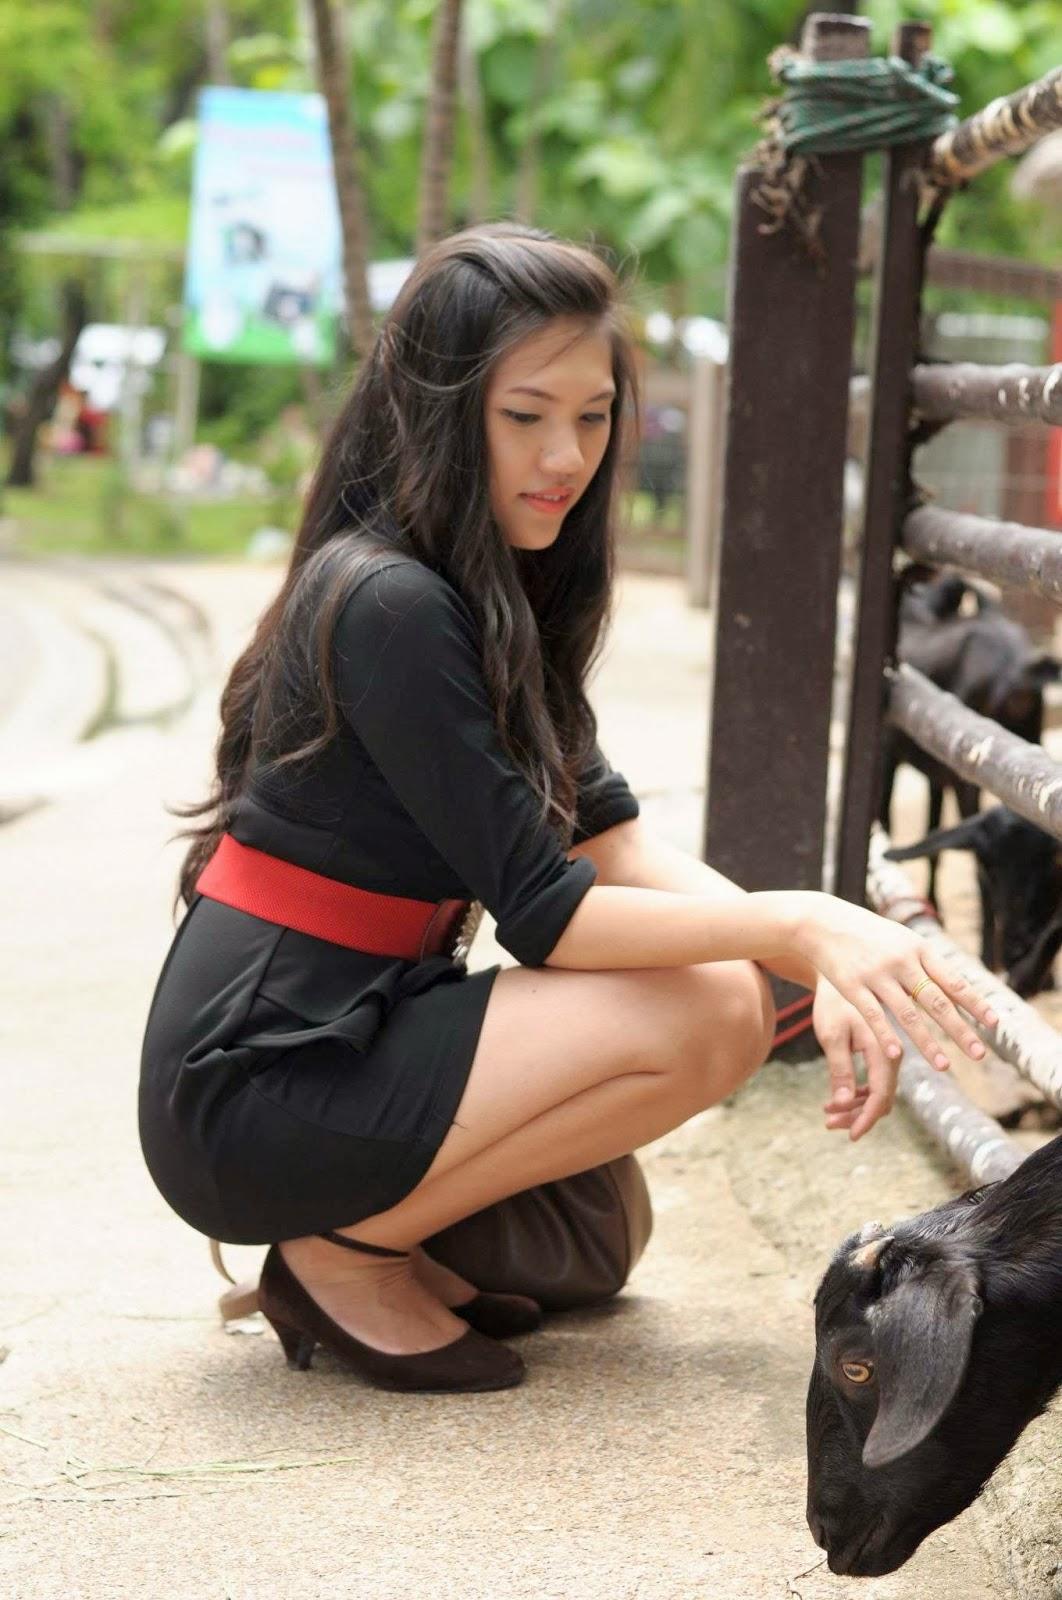 Fotos de chicas y mujeres fotos de nenas tailandesas pimy for Fotos de chicas guapisimas